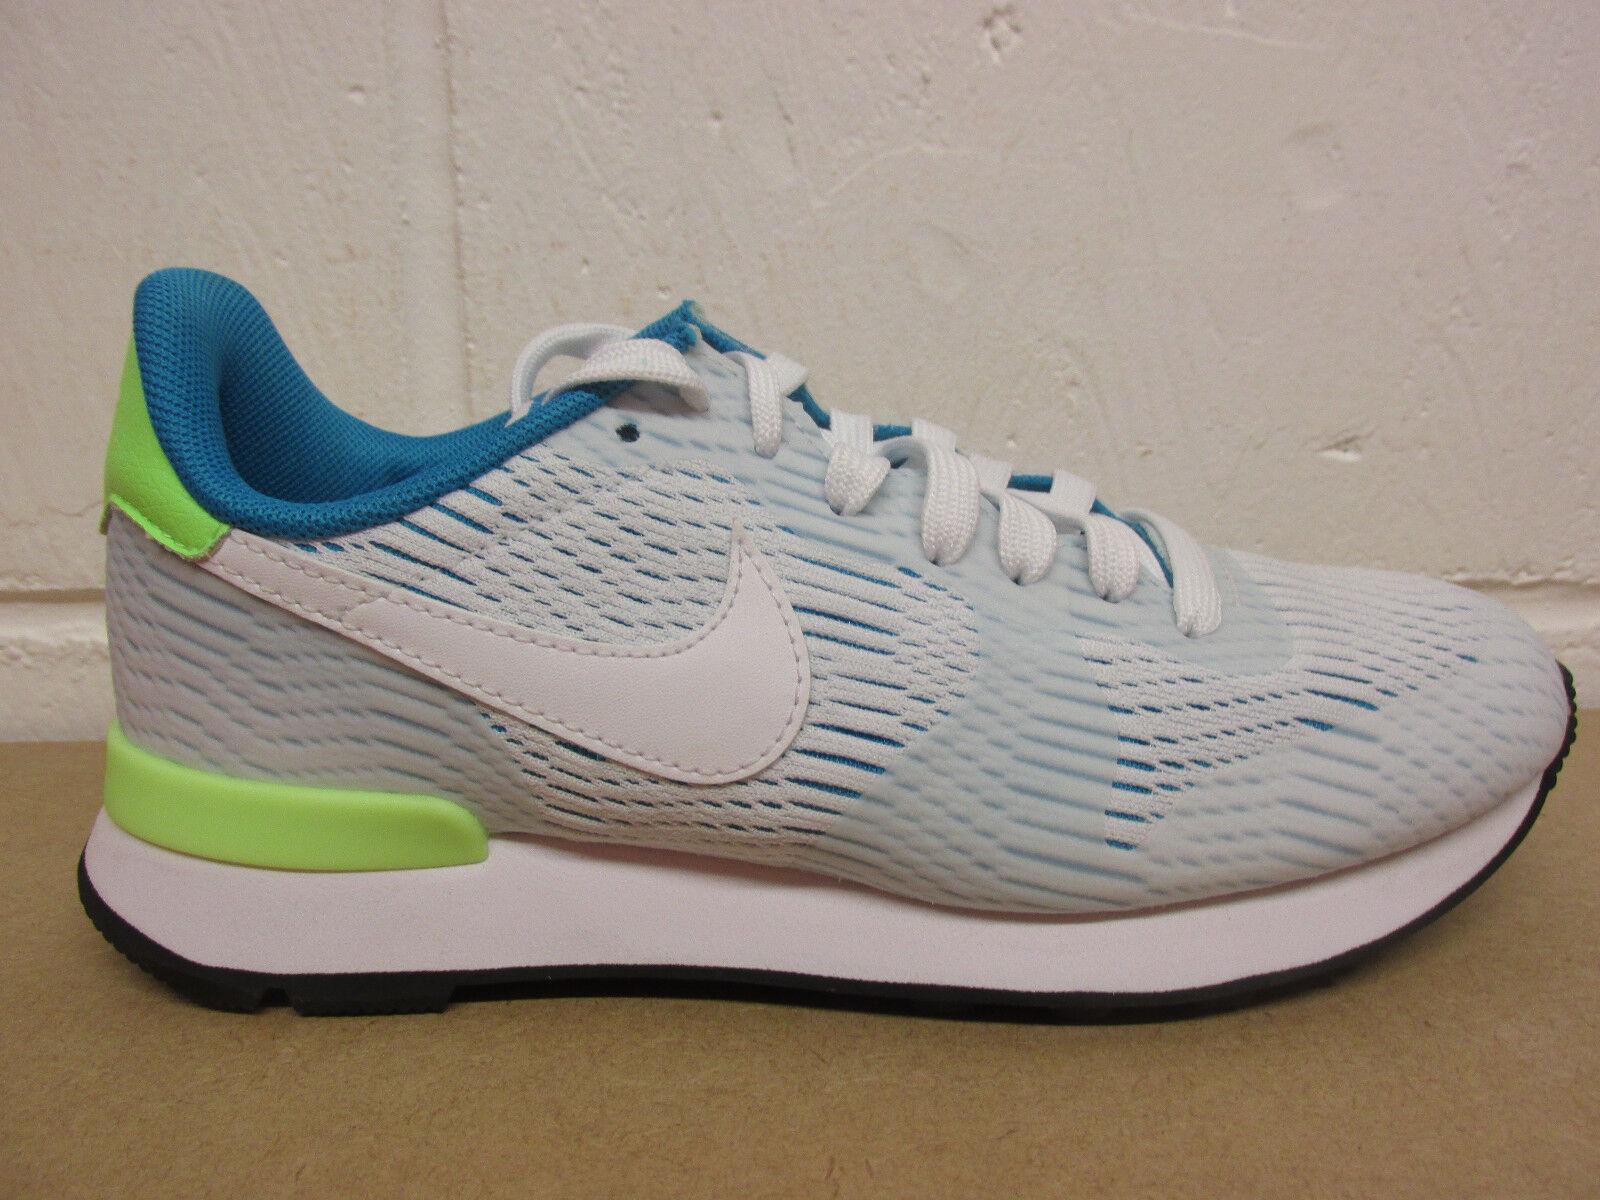 Nike Damen Internationaliste 833815 Em Laufschuhe 833815 Internationaliste 100 Turnschuhe e07350